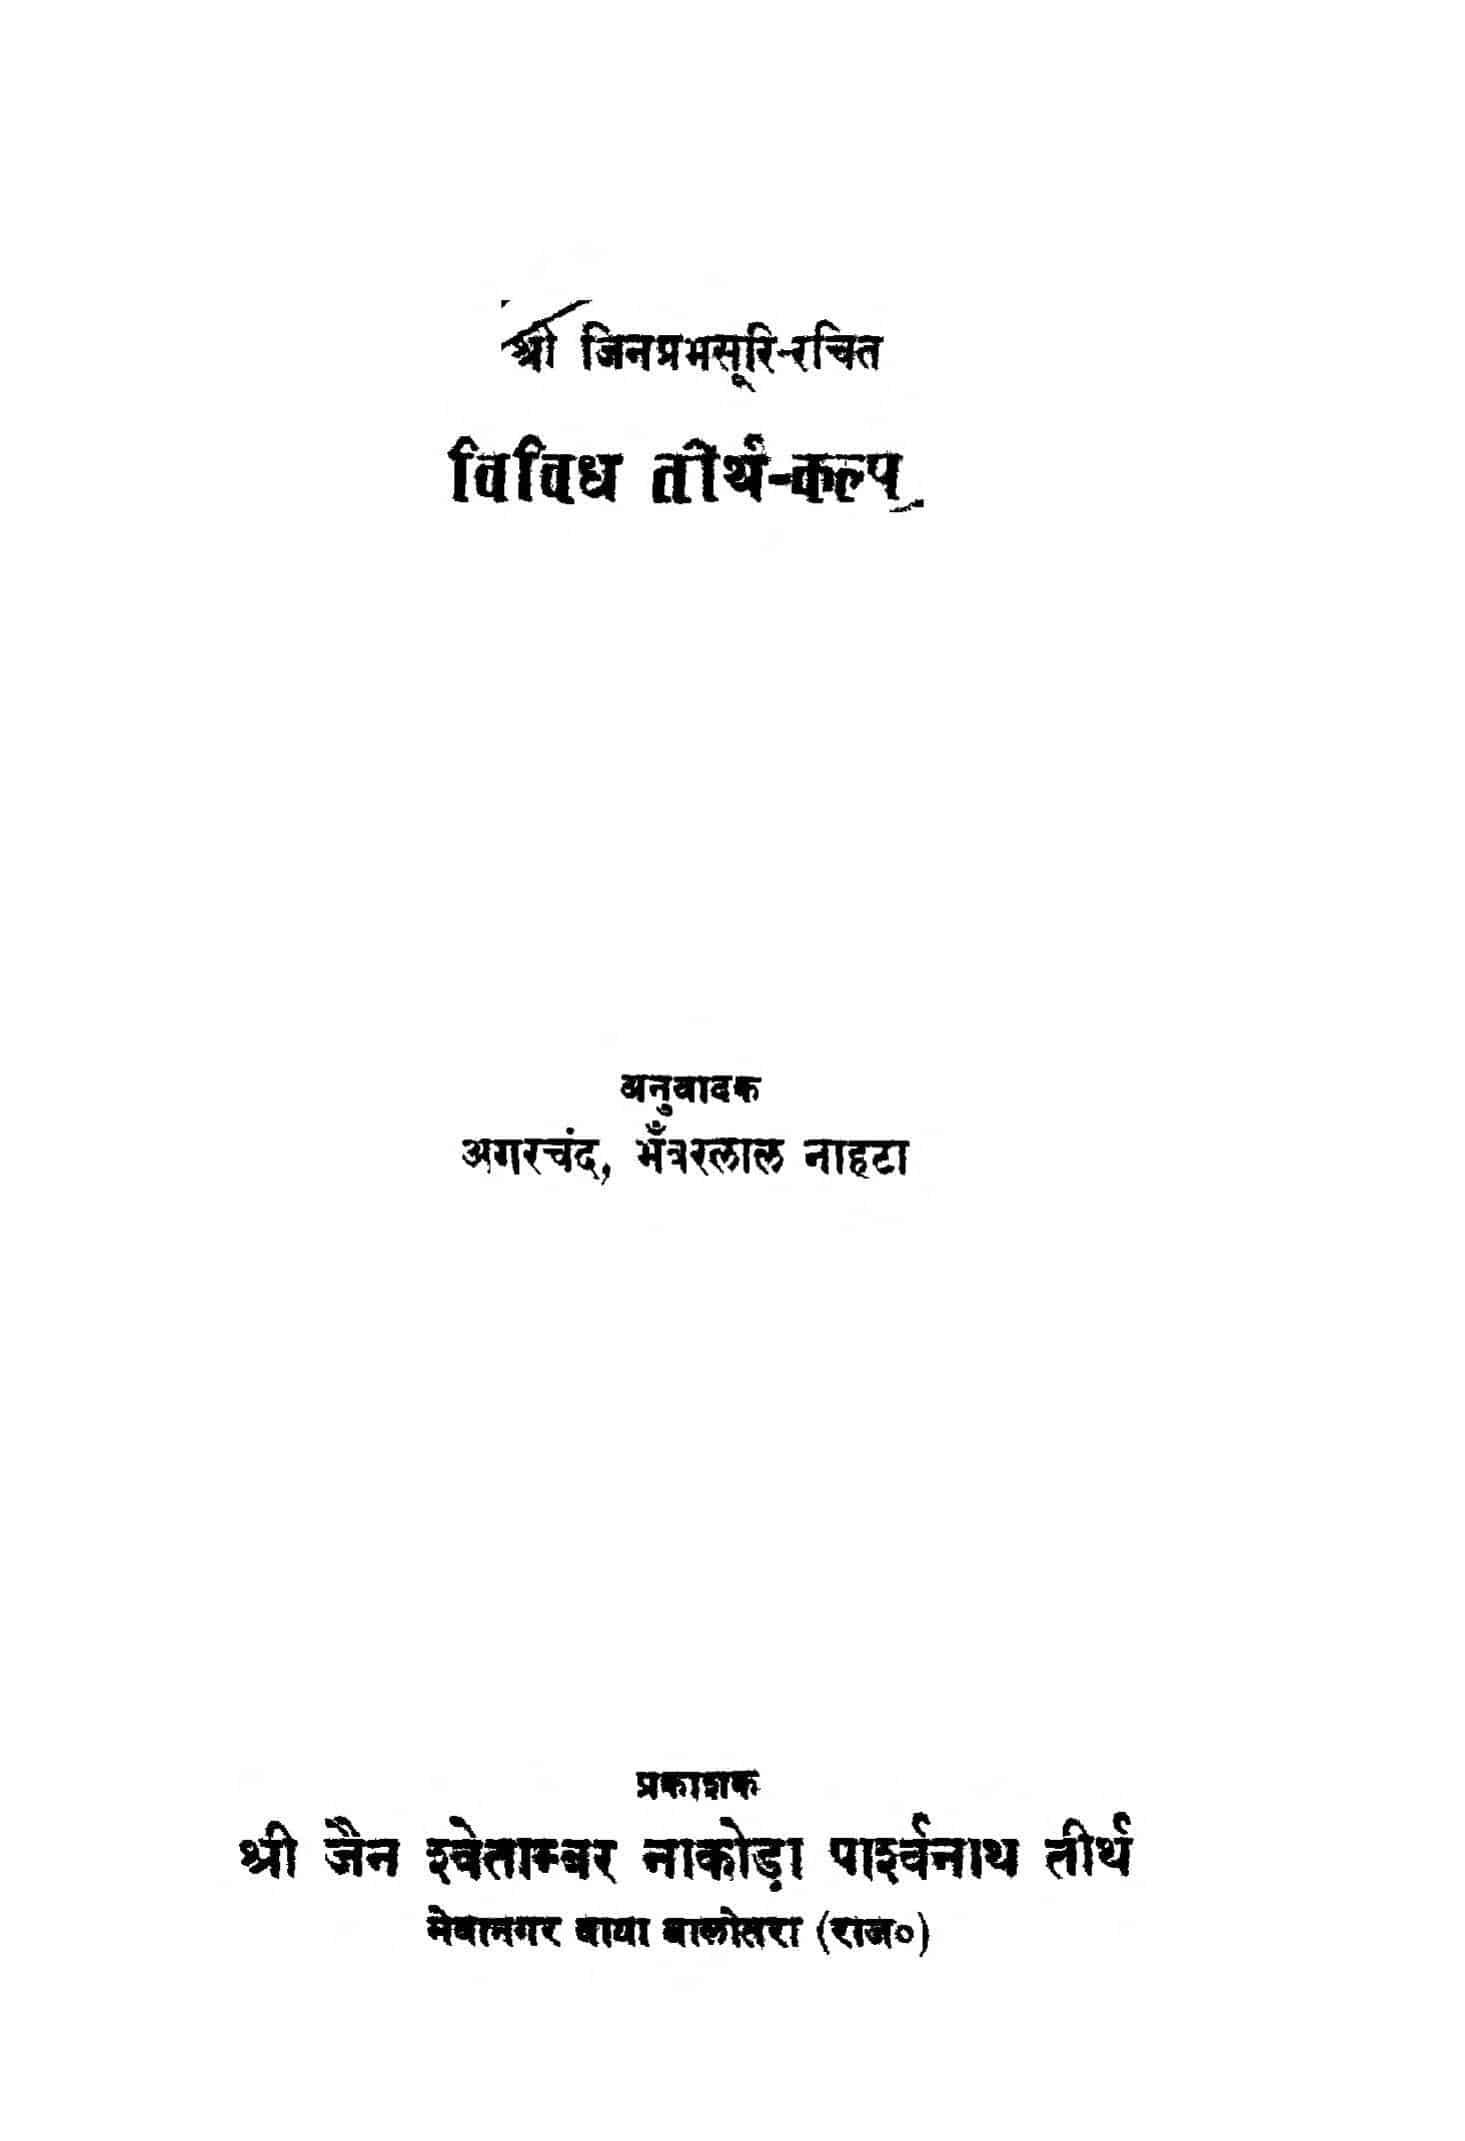 Book Image : विविध तीर्थ कल्प - Vividha Tirth Kalp